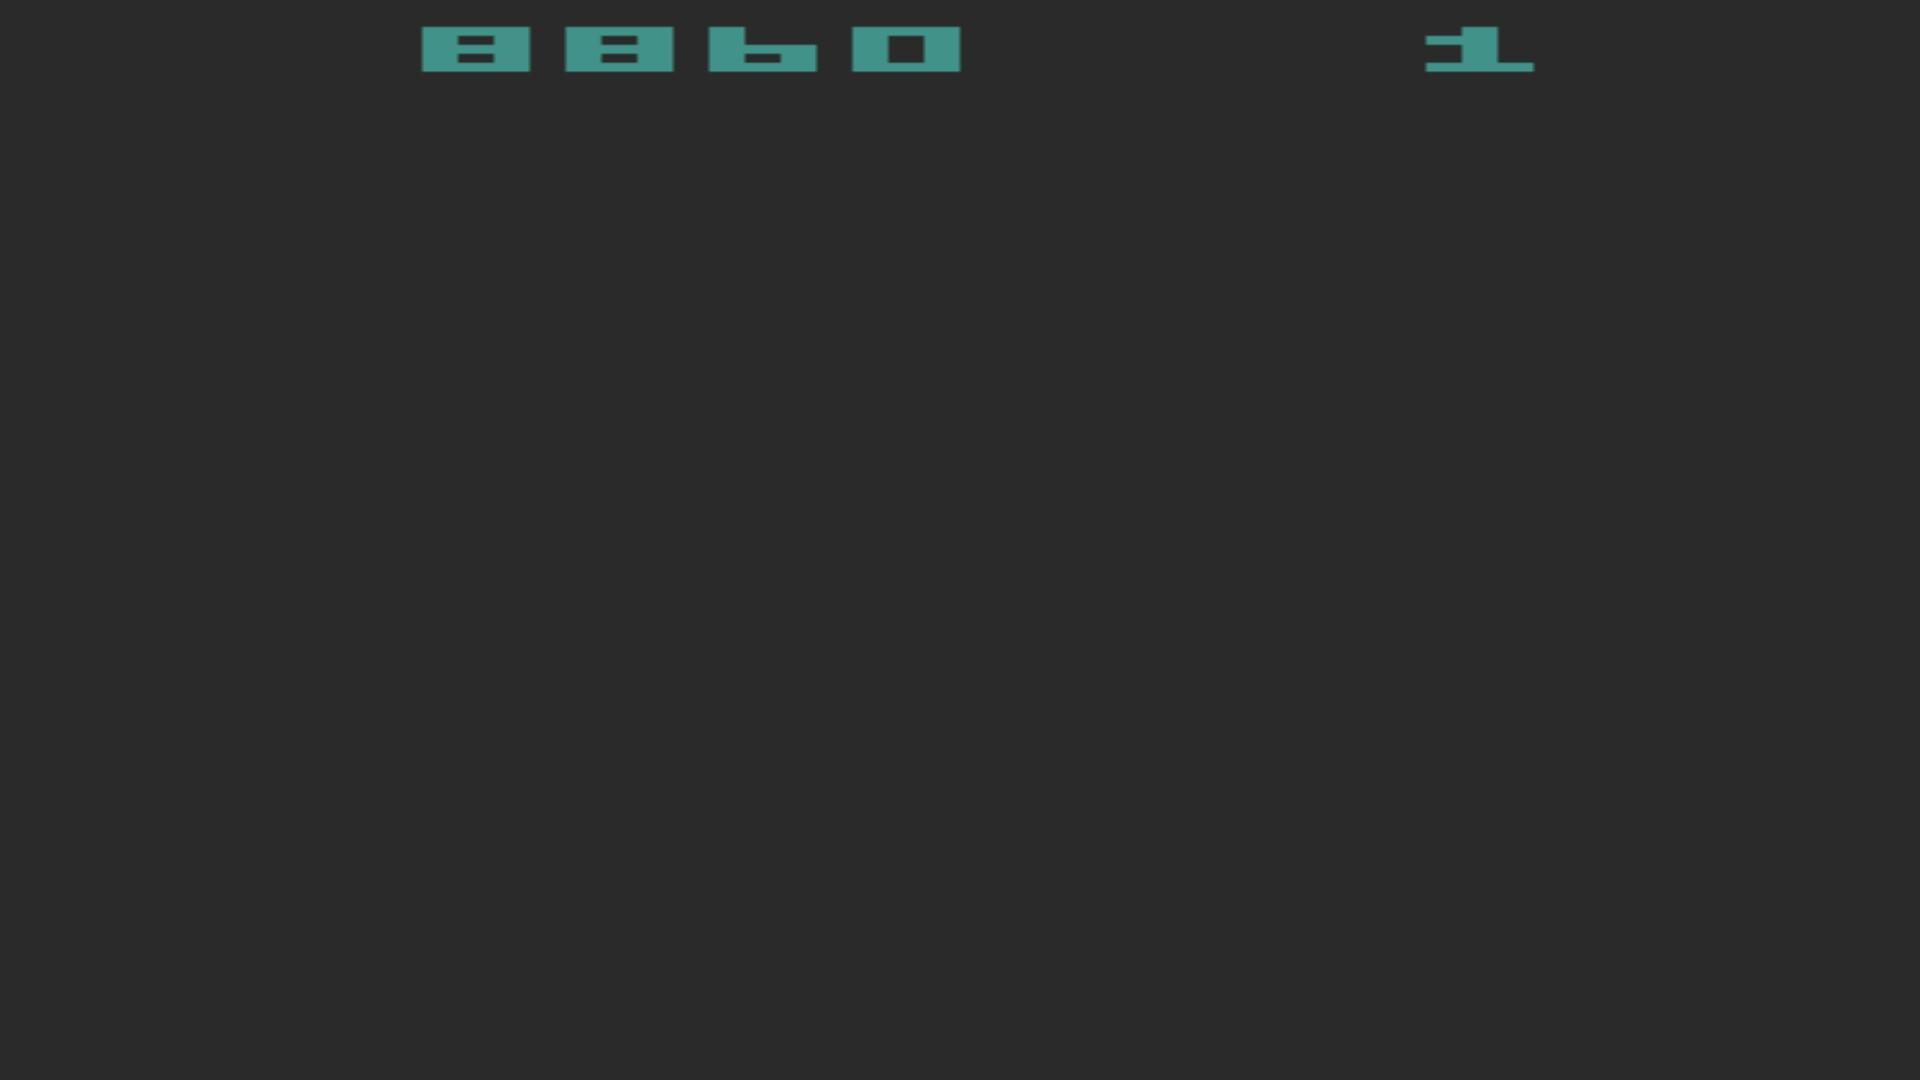 AkinNahtanoj: Asteroids: Game 6 (Atari 2600 Emulated Novice/B Mode) 8,860 points on 2020-10-11 14:20:41